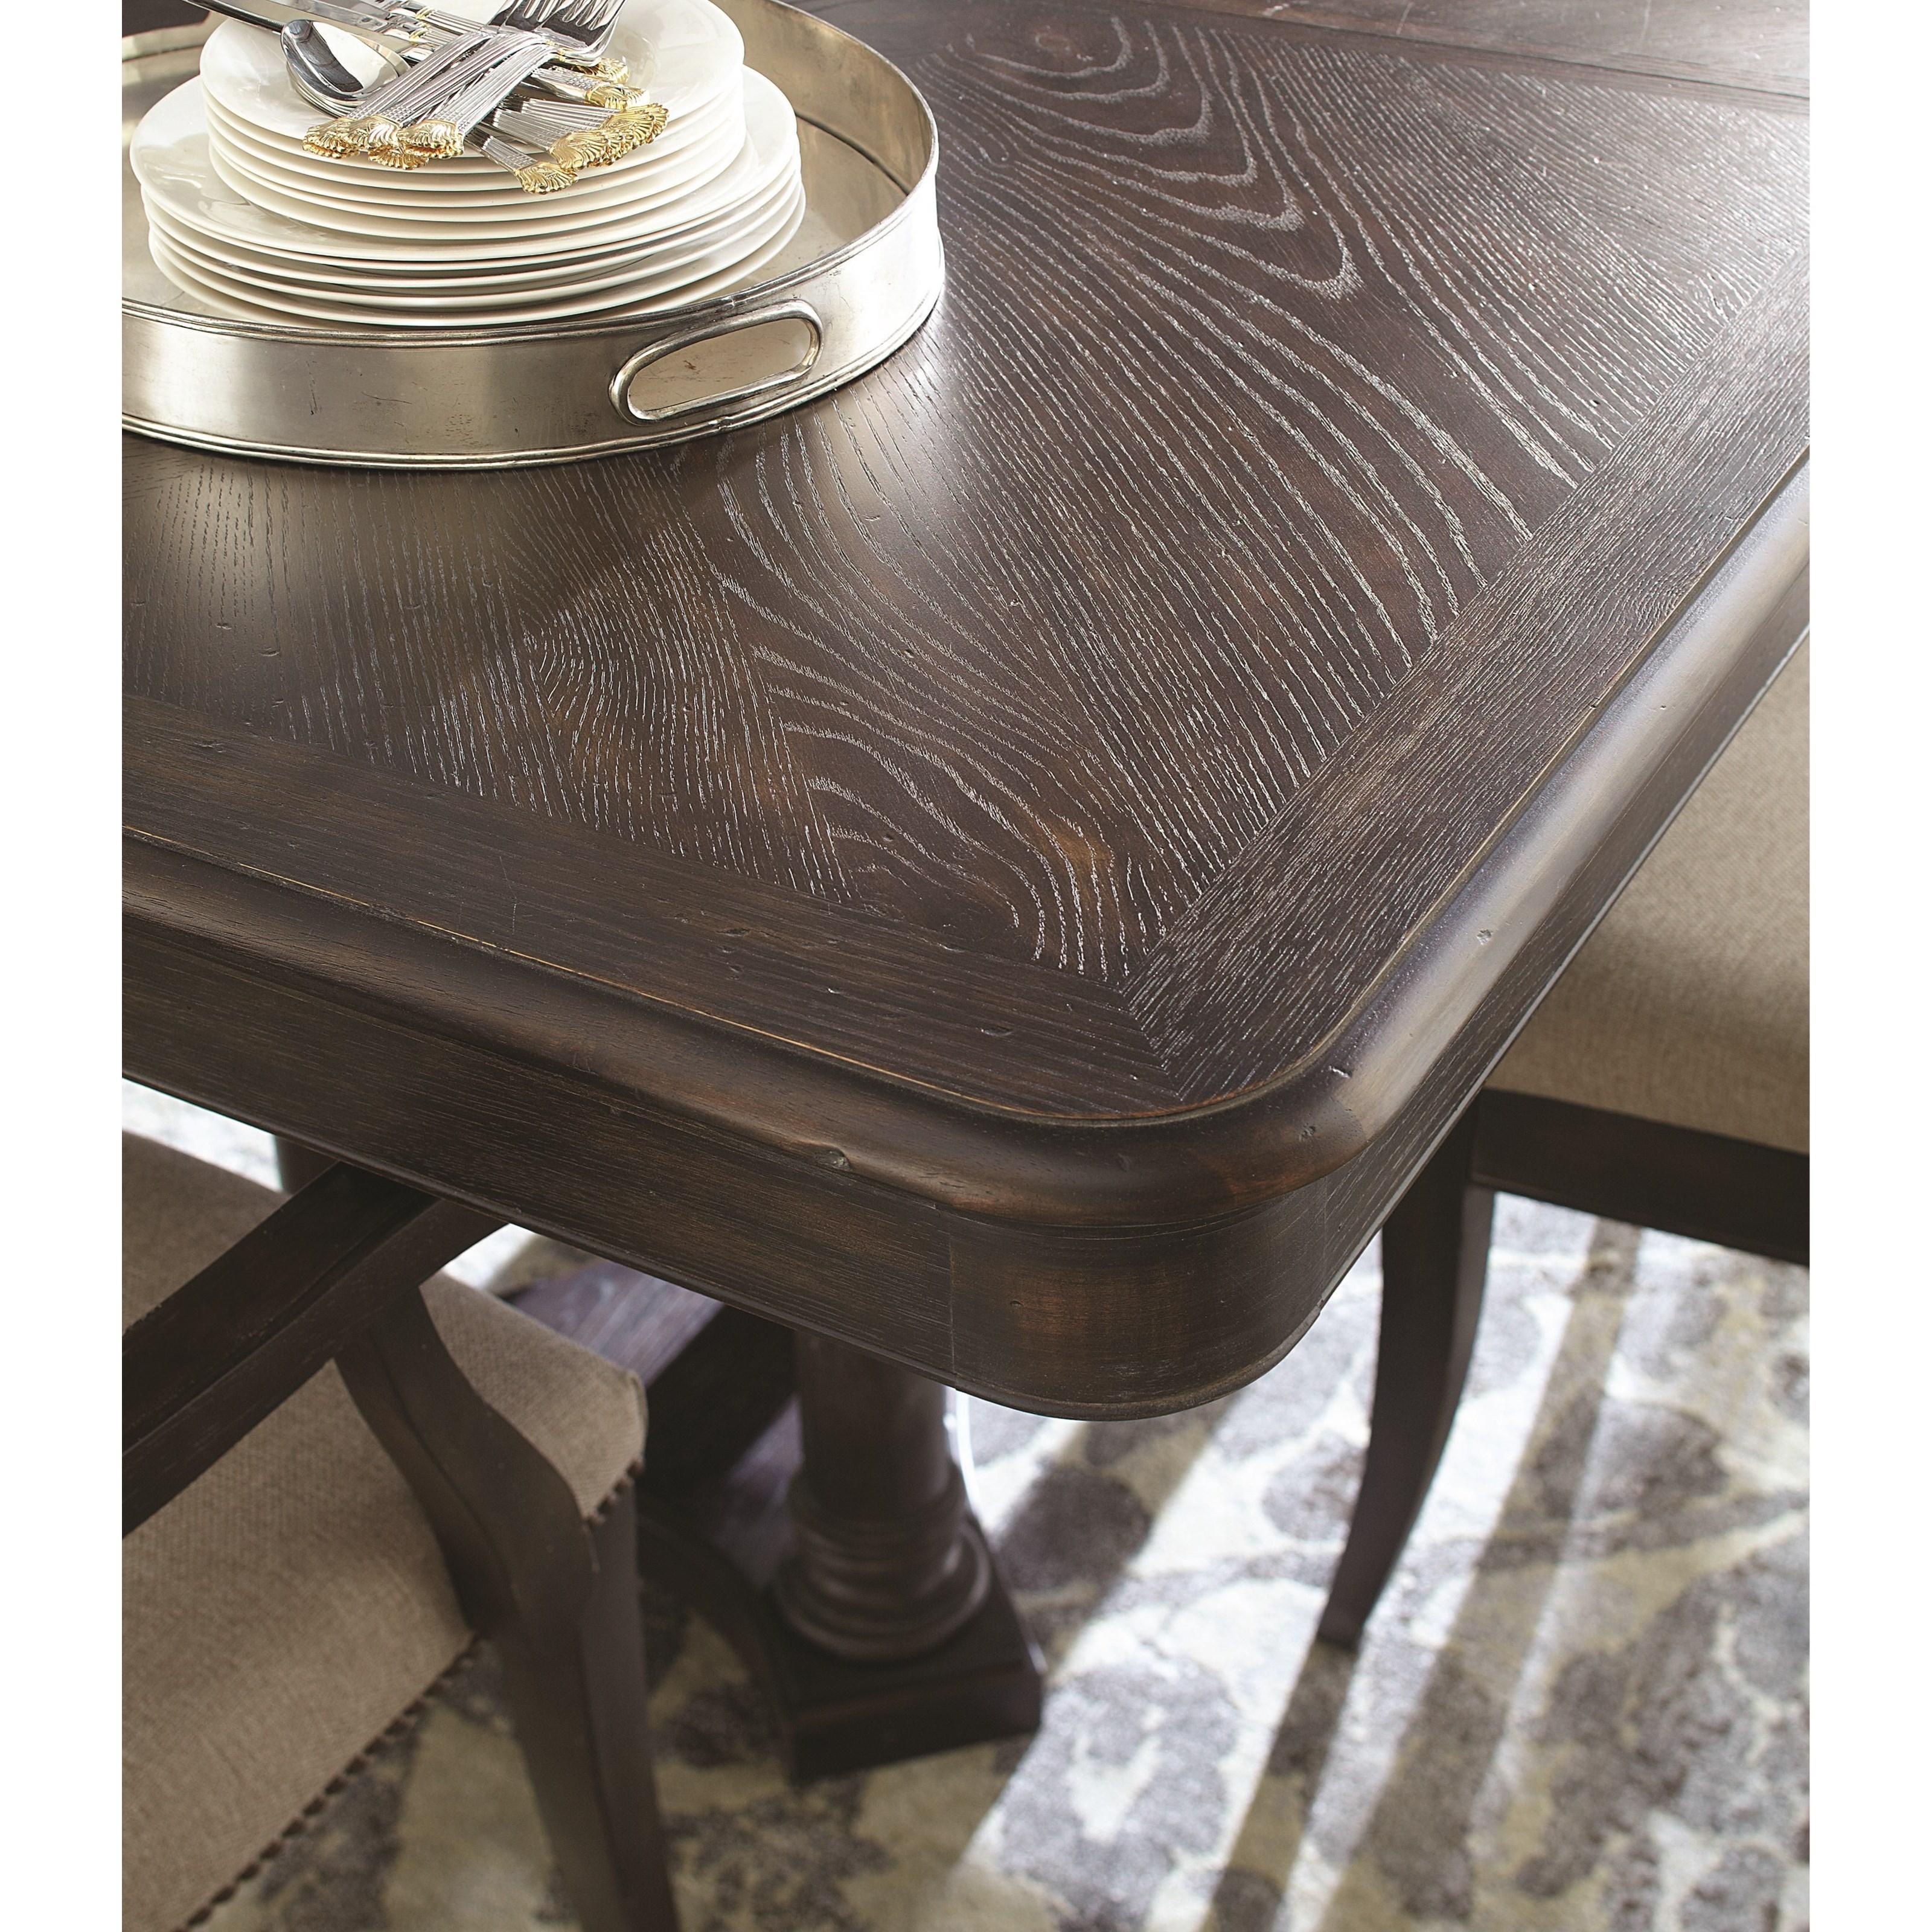 Bassett Emporium Rectangular Dining Table seats up to 10  : products2Fbassett2Fcolor2Femporium20by20bassett4513 tb462B4676 b9 from www.johnvschultz.com size 3200 x 3200 jpeg 1994kB